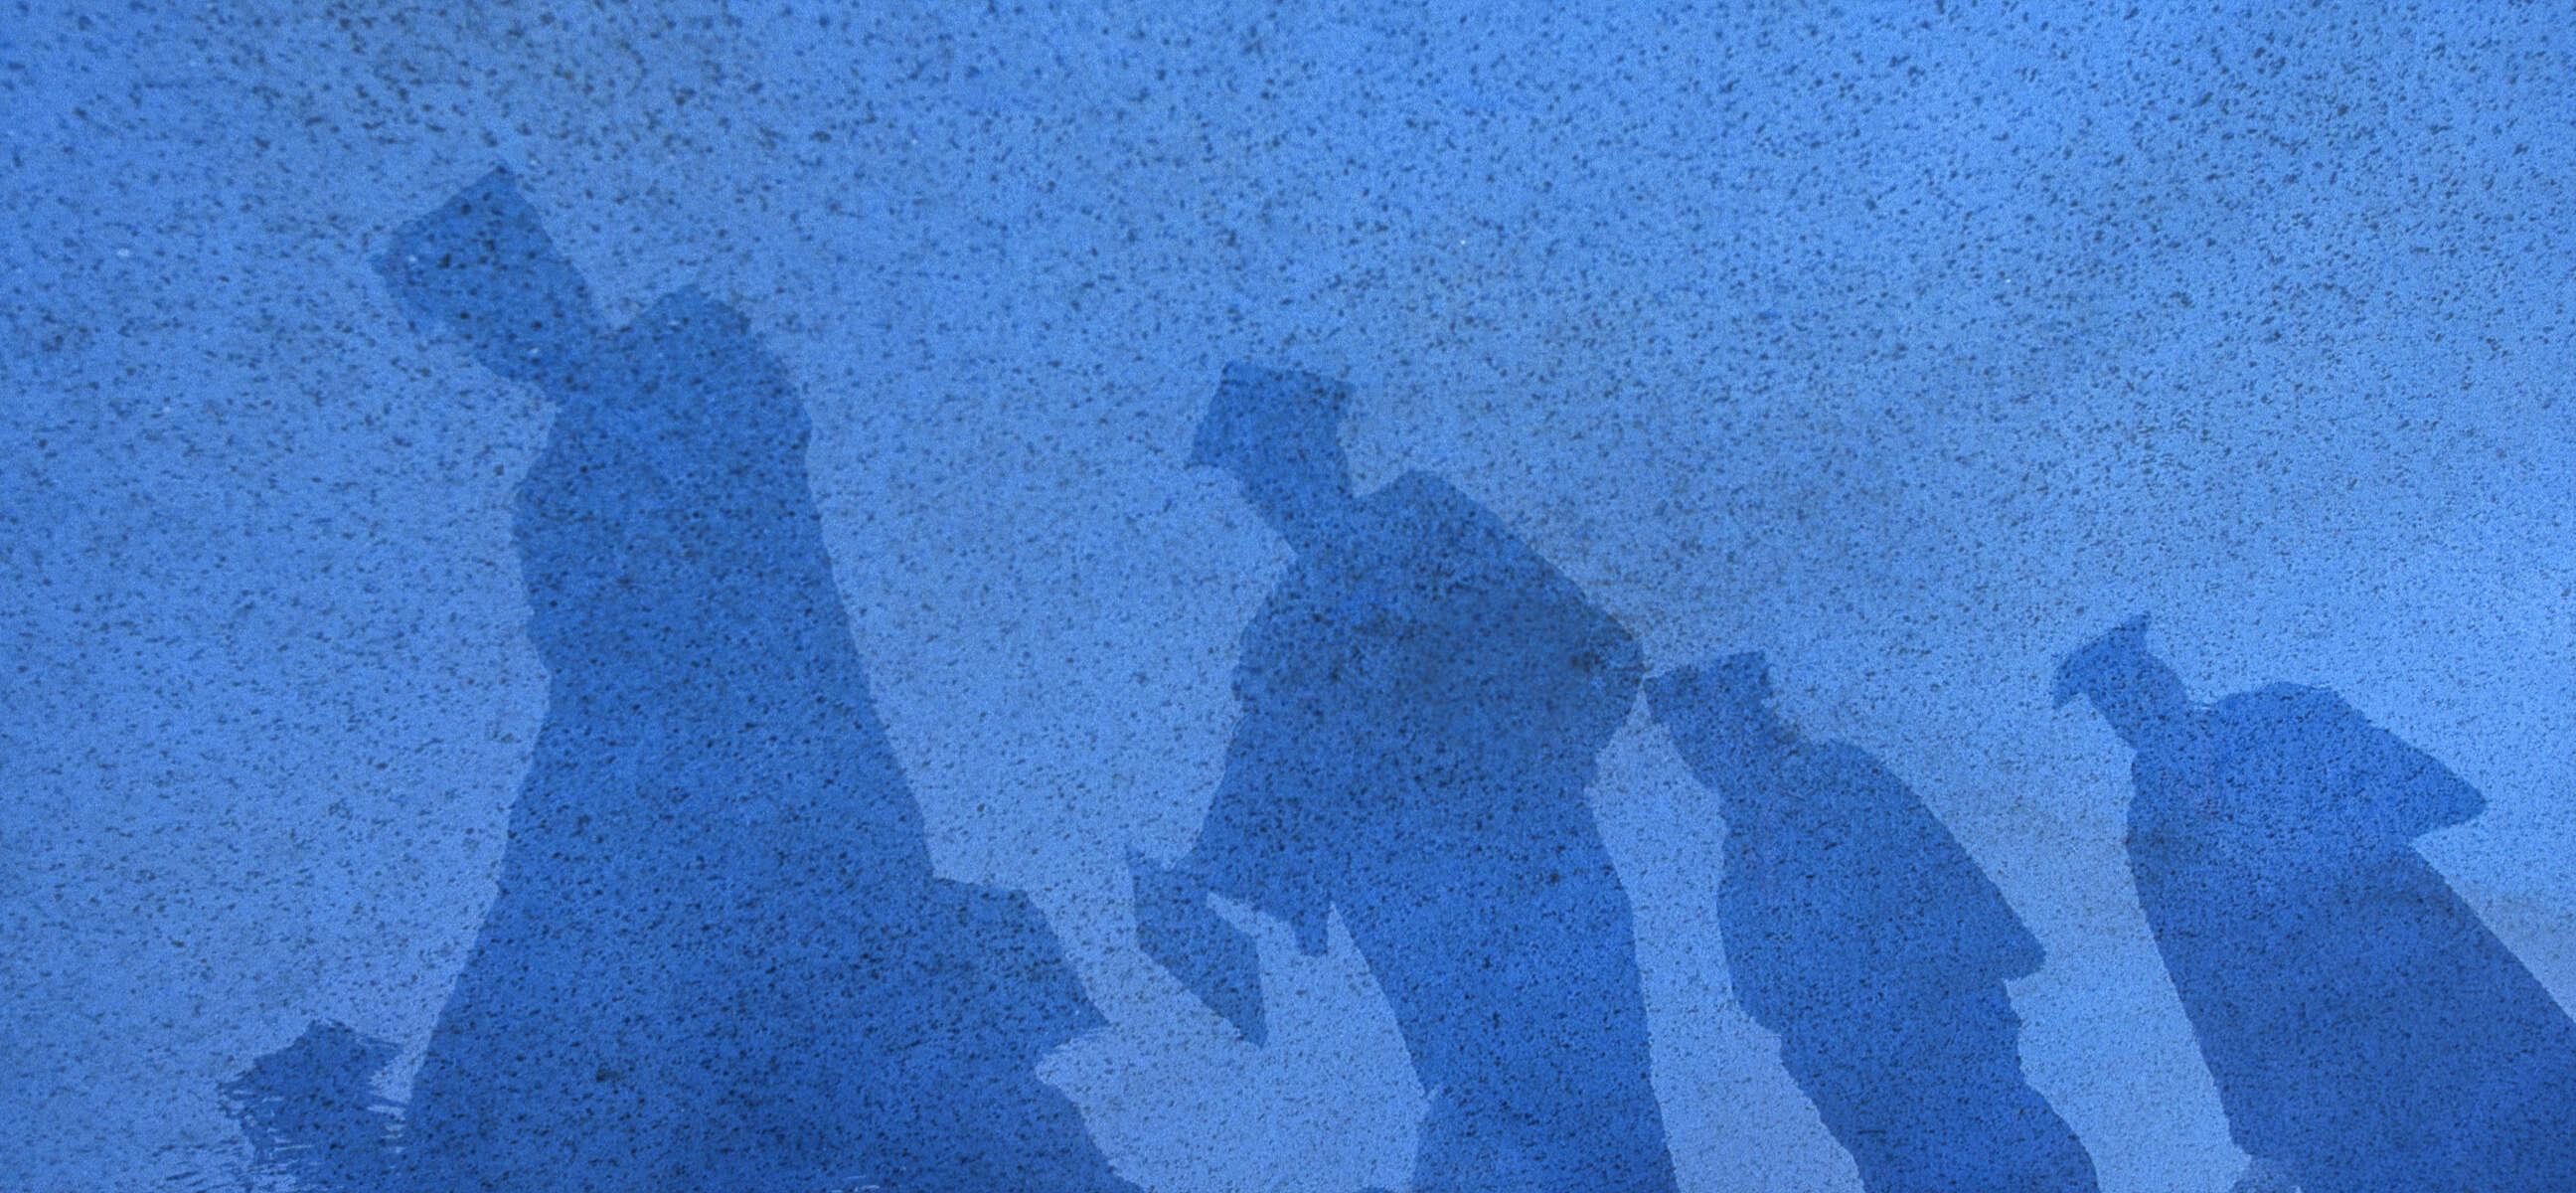 Graduation-shadows